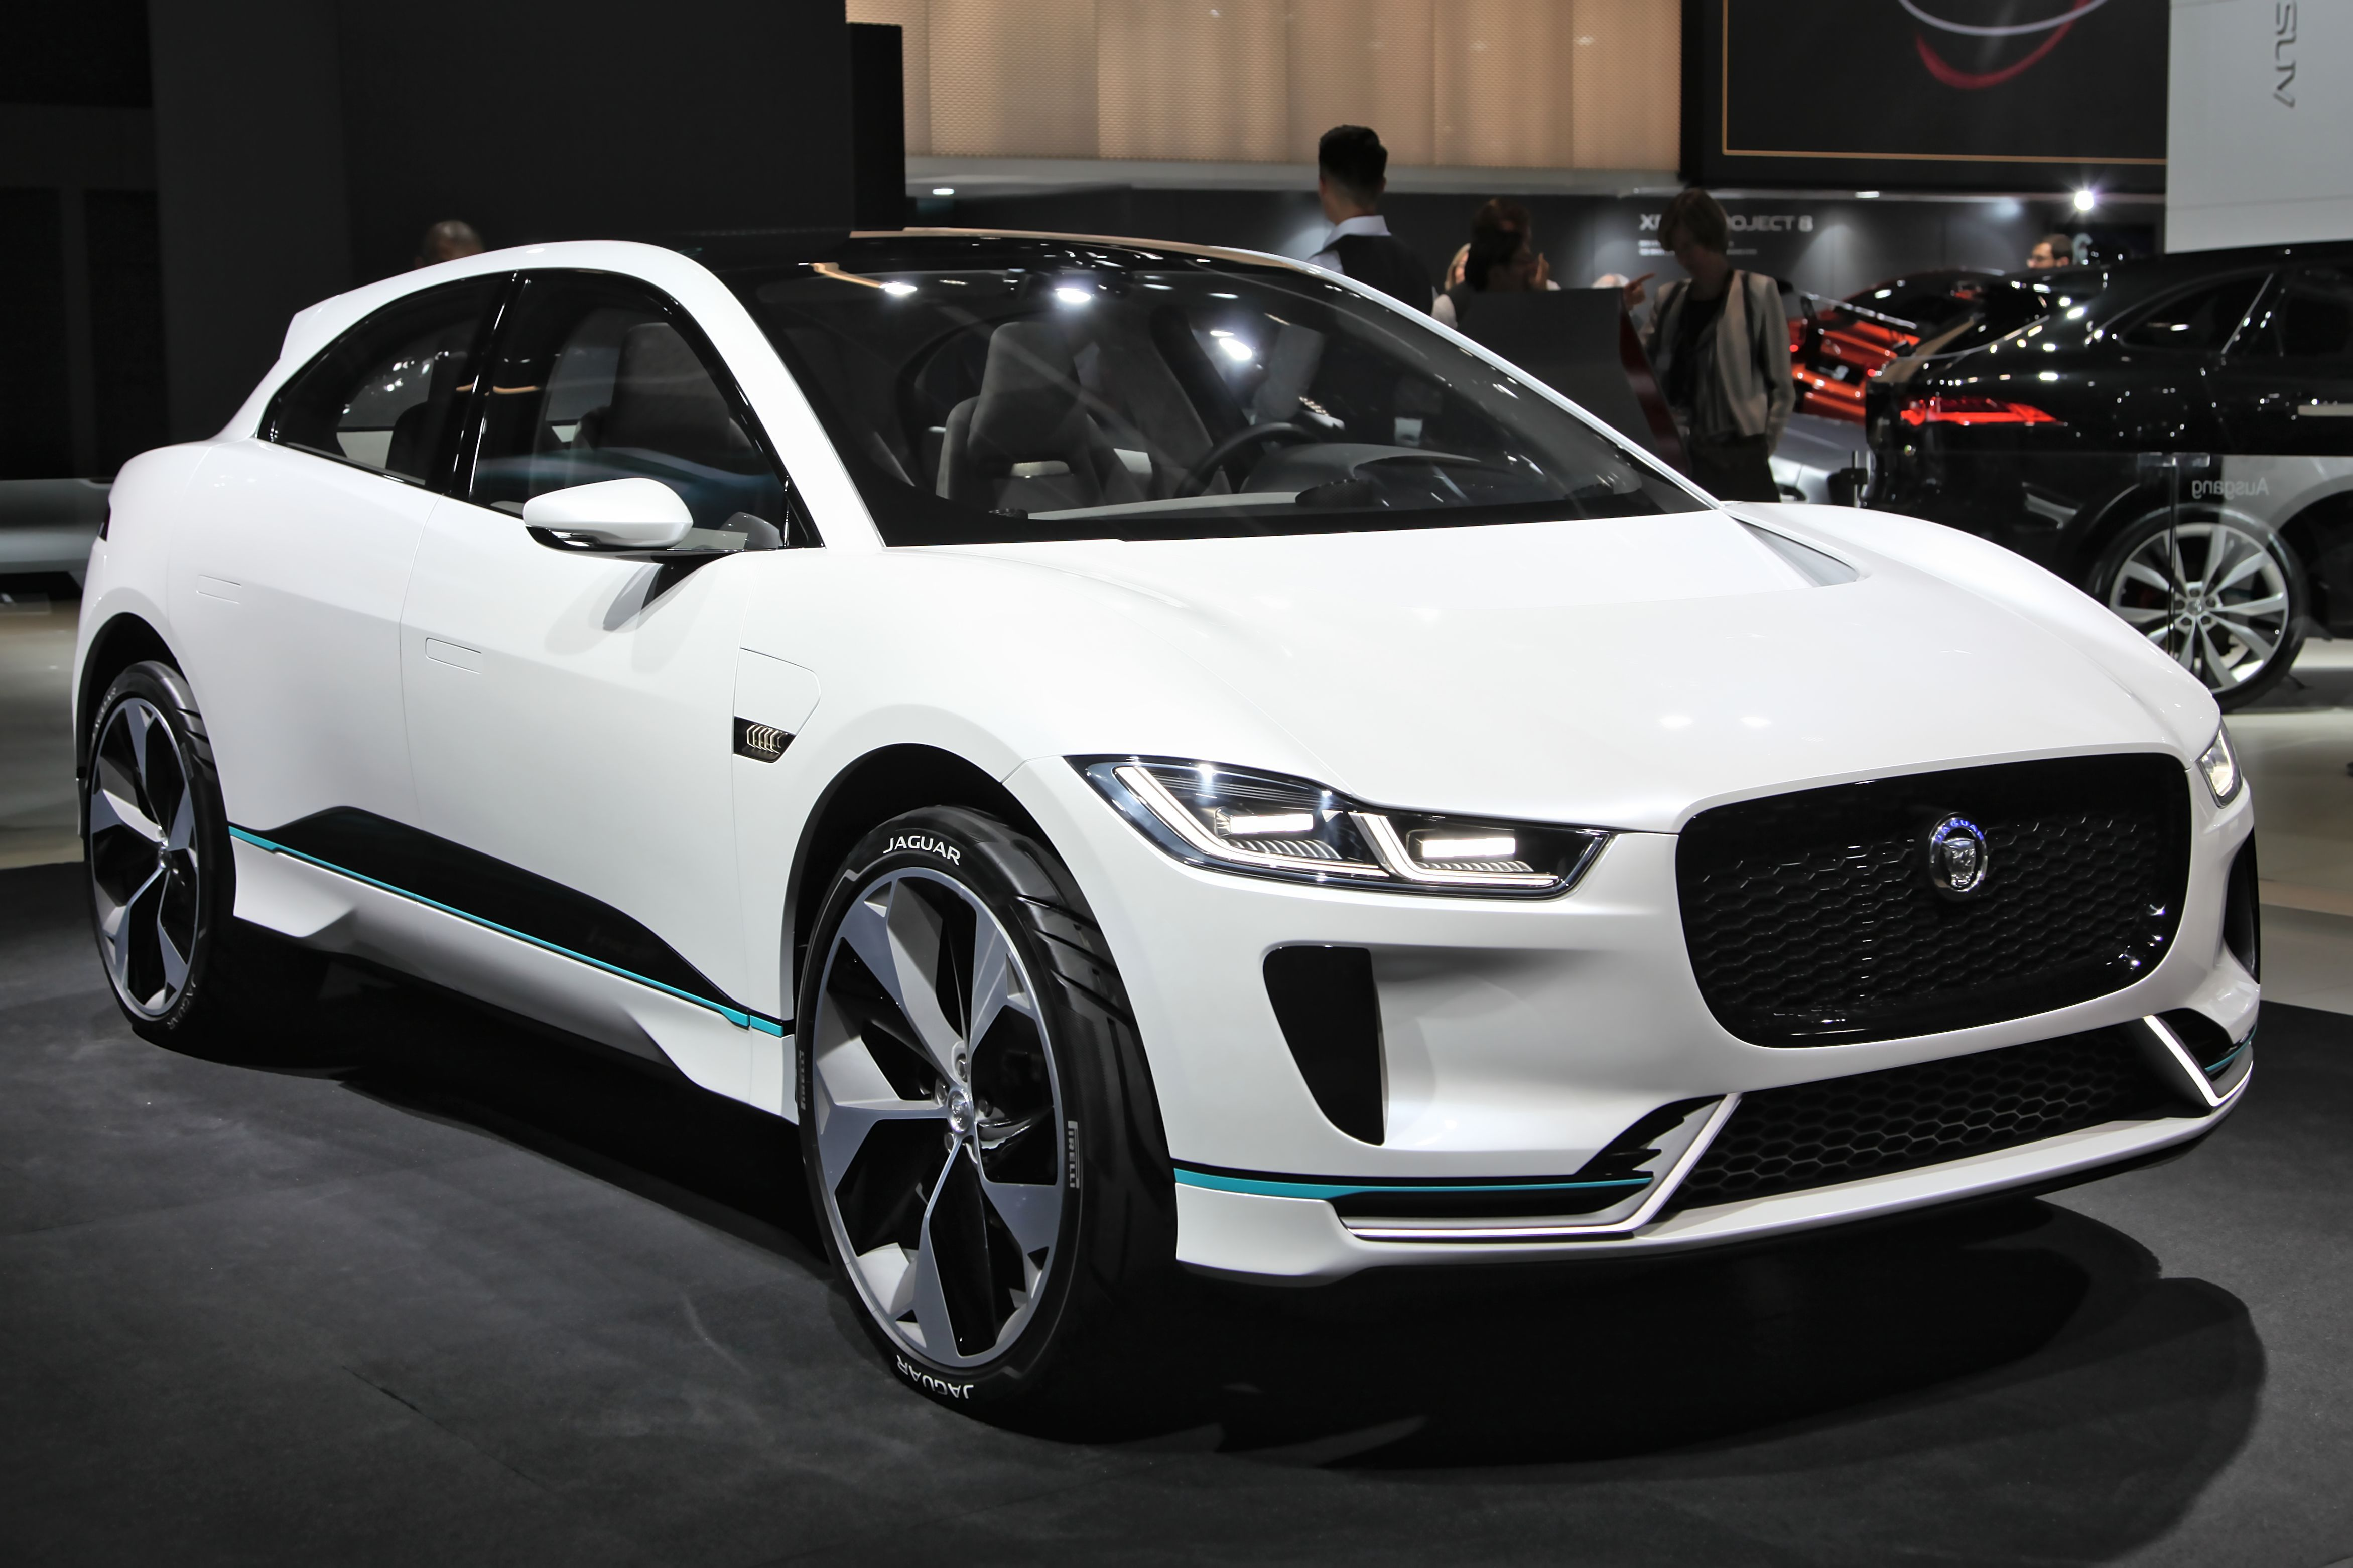 The 2019 Jaguar I Pace Wiki Reviews 2019 Jaguar I Pace Wiki Release Electric Cars Electric Cars In India Jaguar